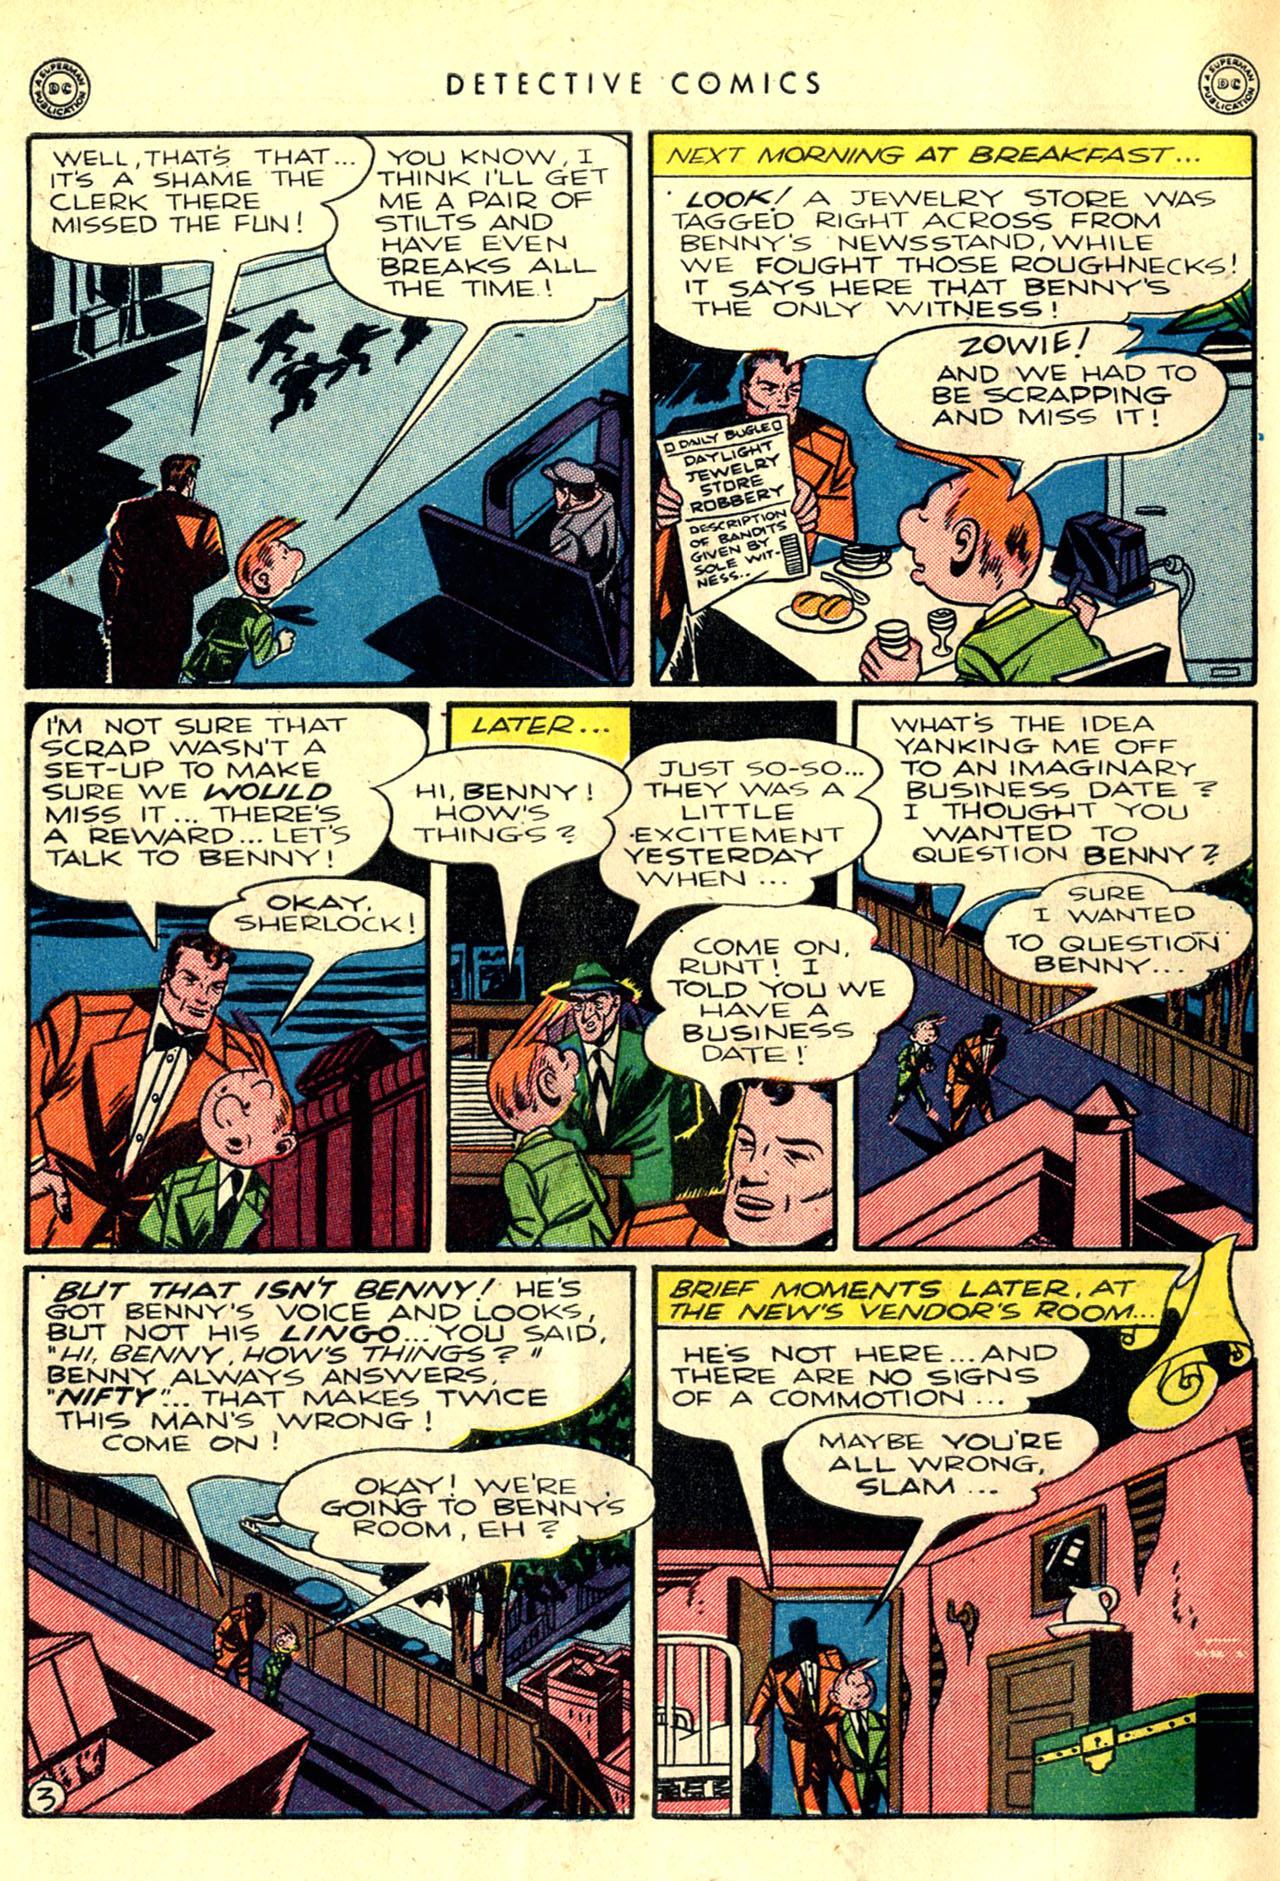 Read online Detective Comics (1937) comic -  Issue #90 - 44